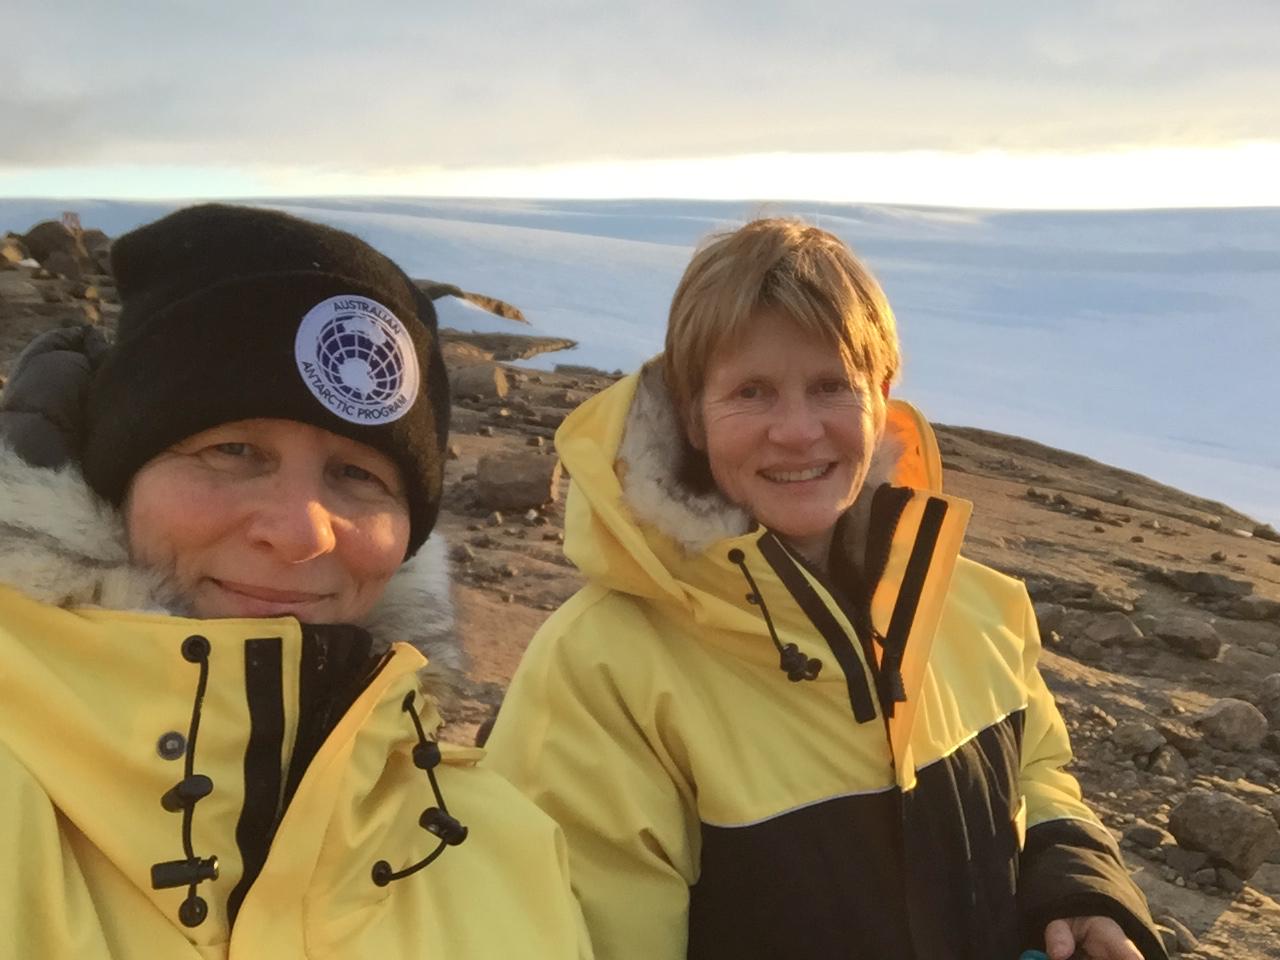 Jane Allen and Dr Jesse Blackadder, 2018 Australian Antarctic Arts Fellows. Image courtesy Jesse Blackadder.